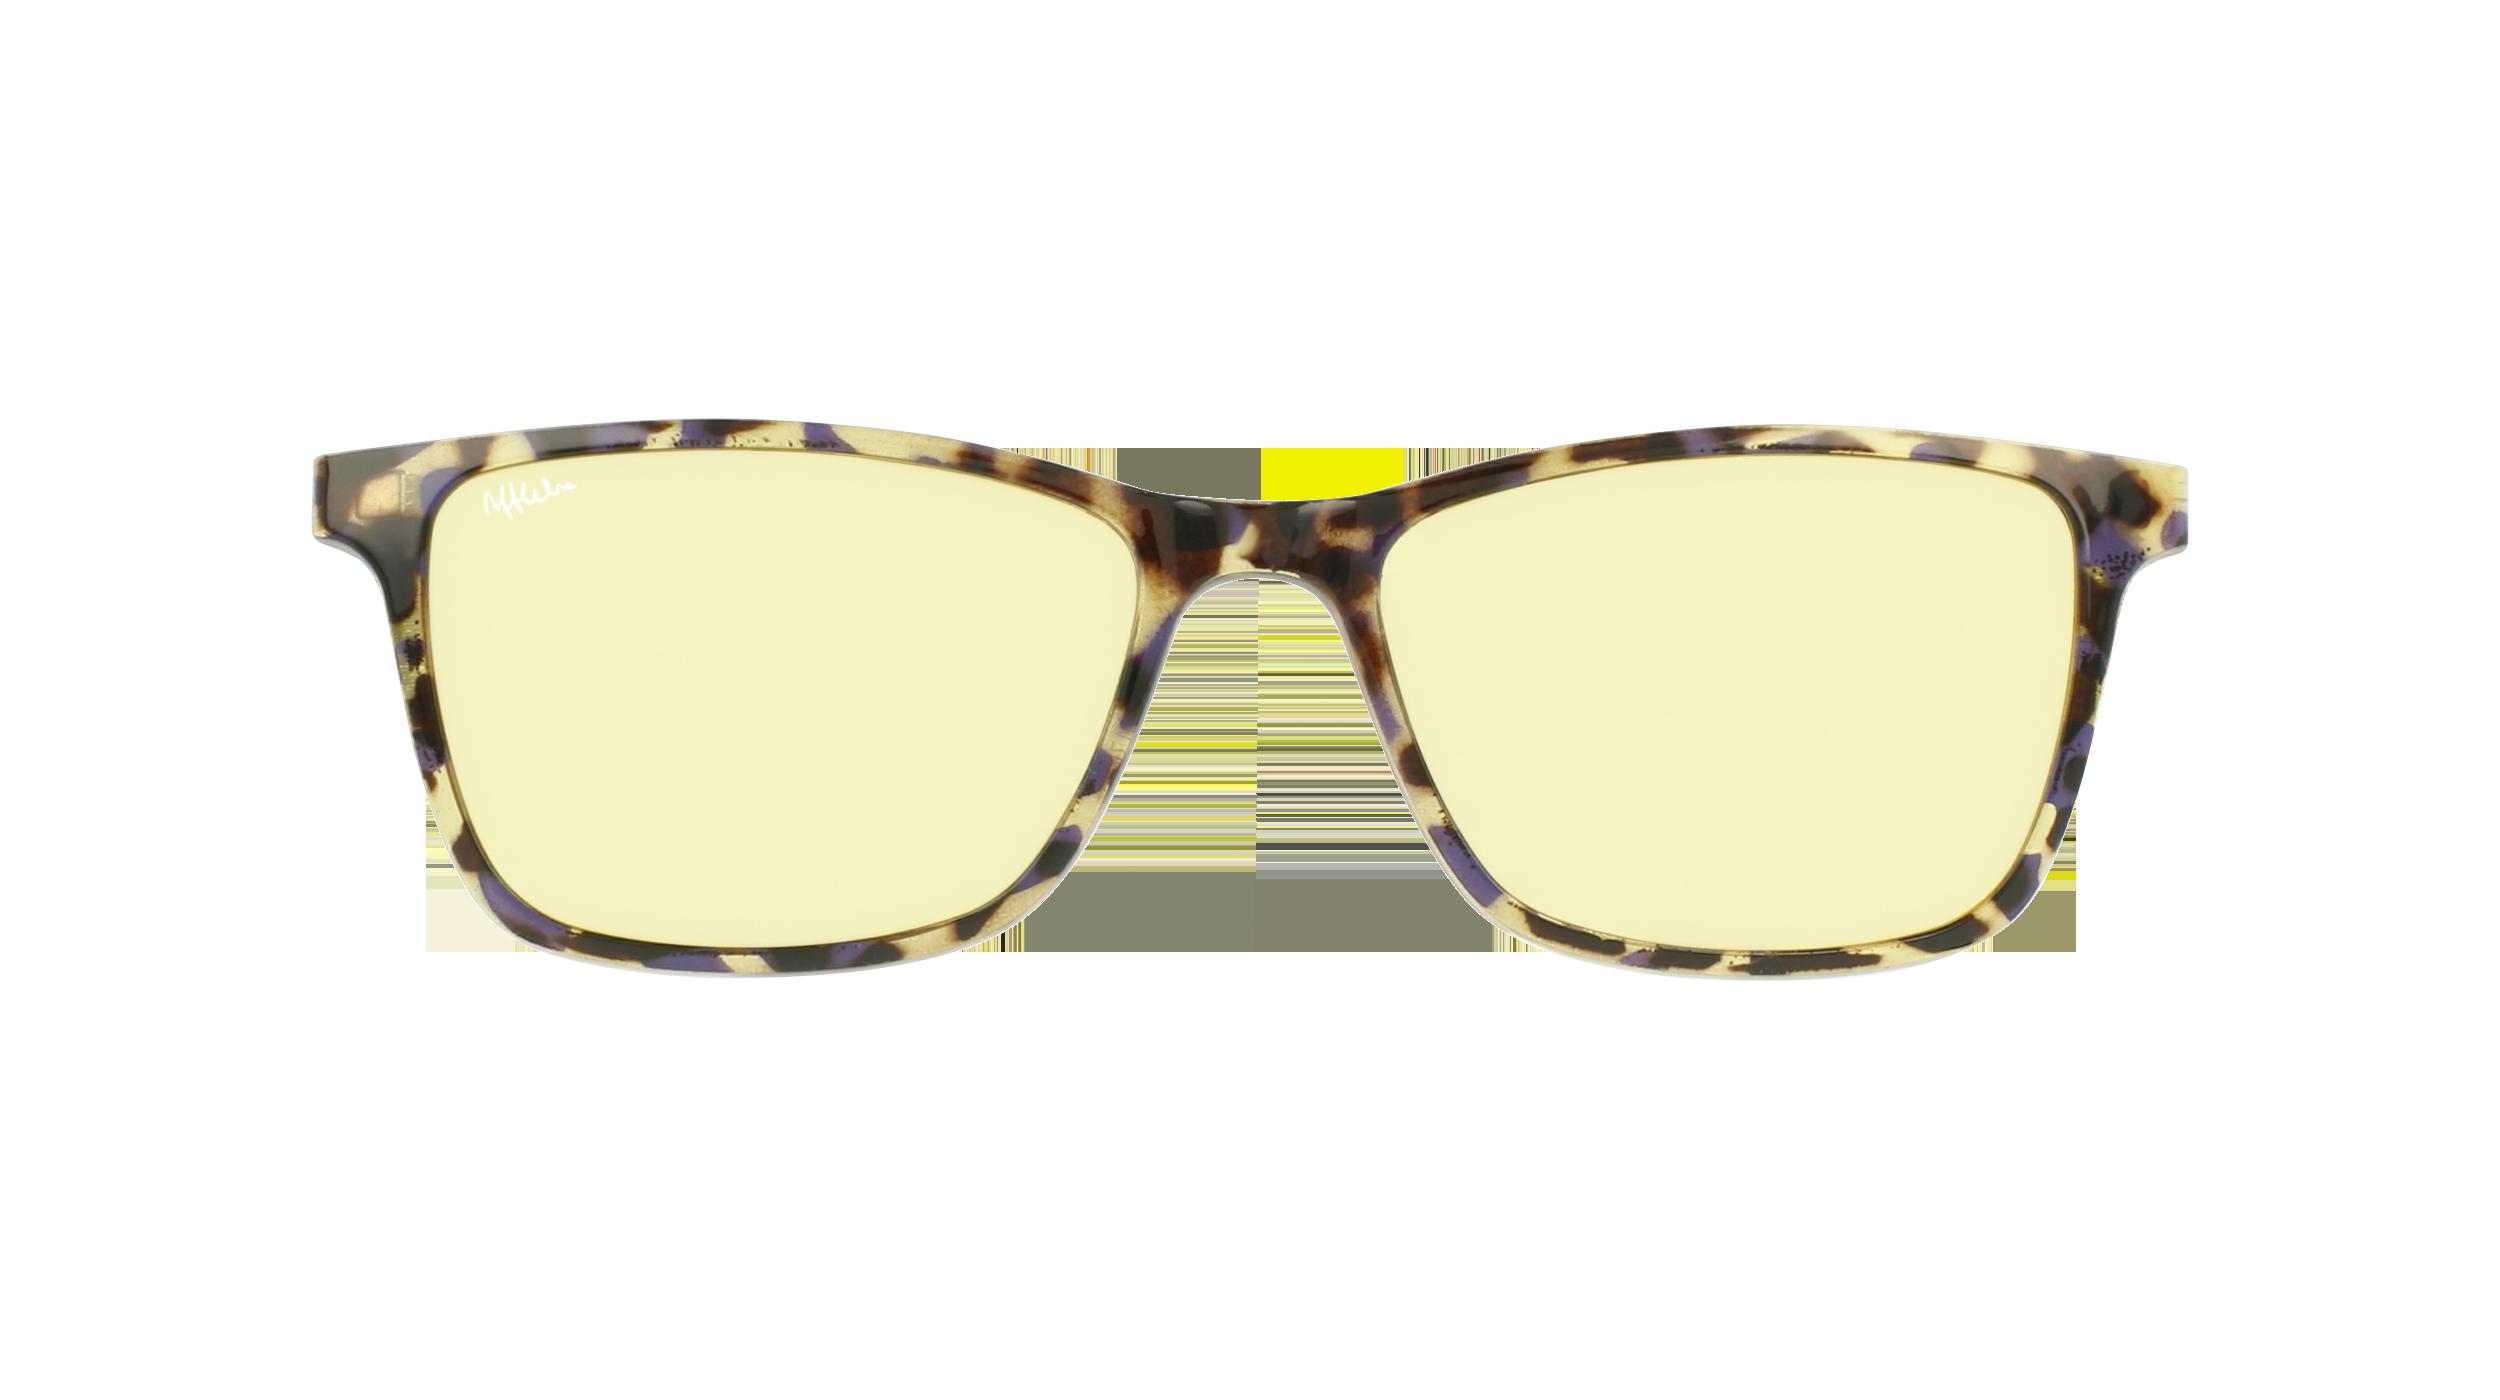 afflelou/france/products/smart_clip/clips_glasses/07630036457801.png